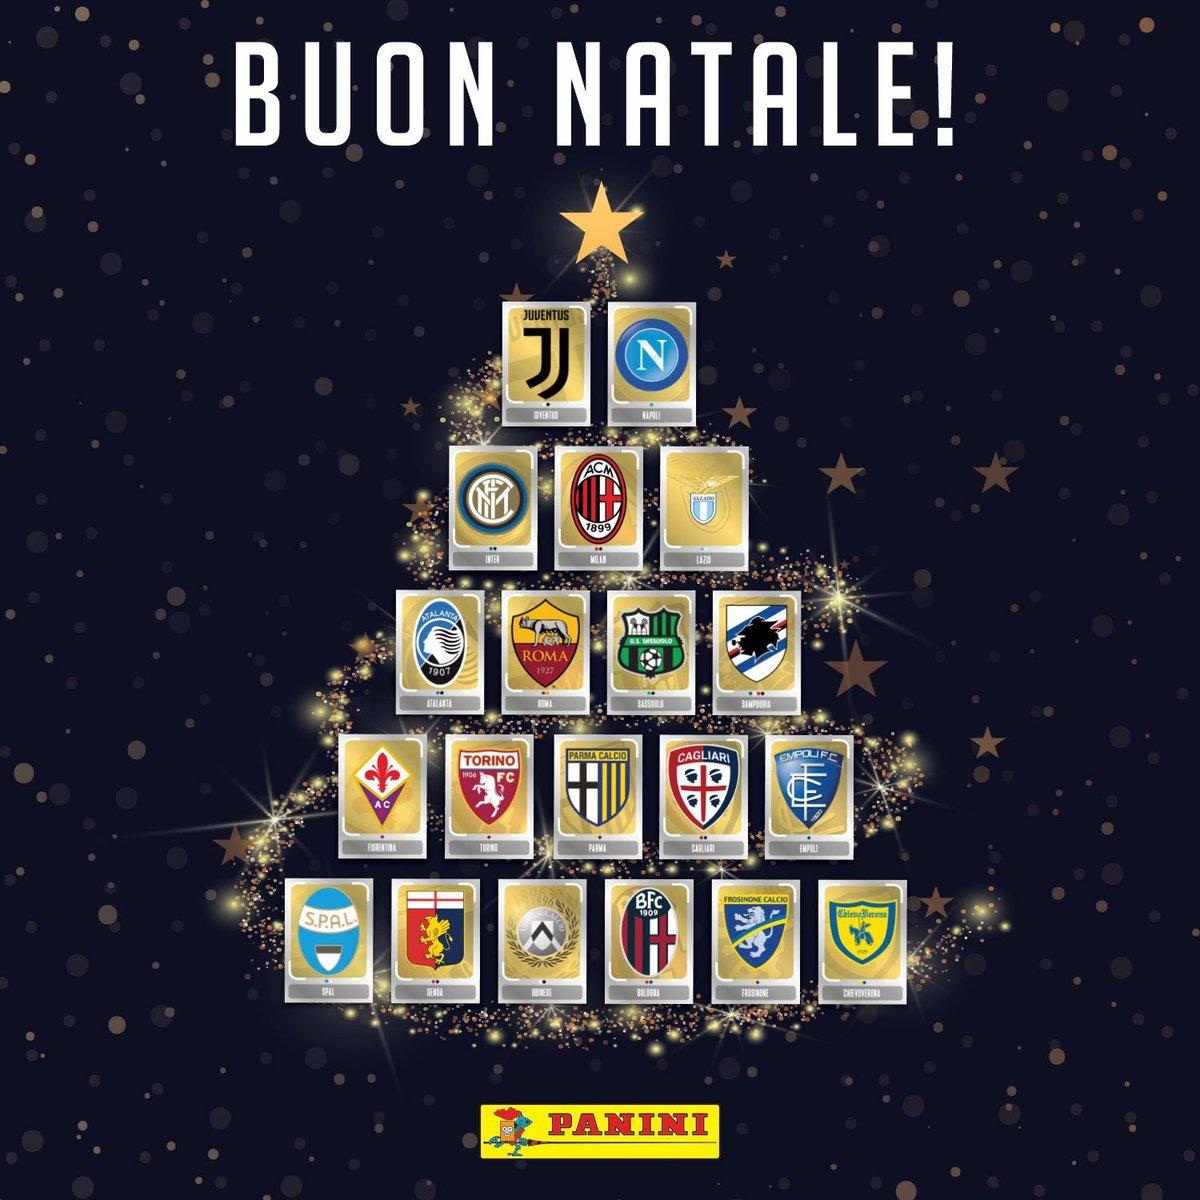 Auguri Di Buon Natale Juve.Figurine Panini On Twitter Tanti Auguri Di Buon Natale Da Panini